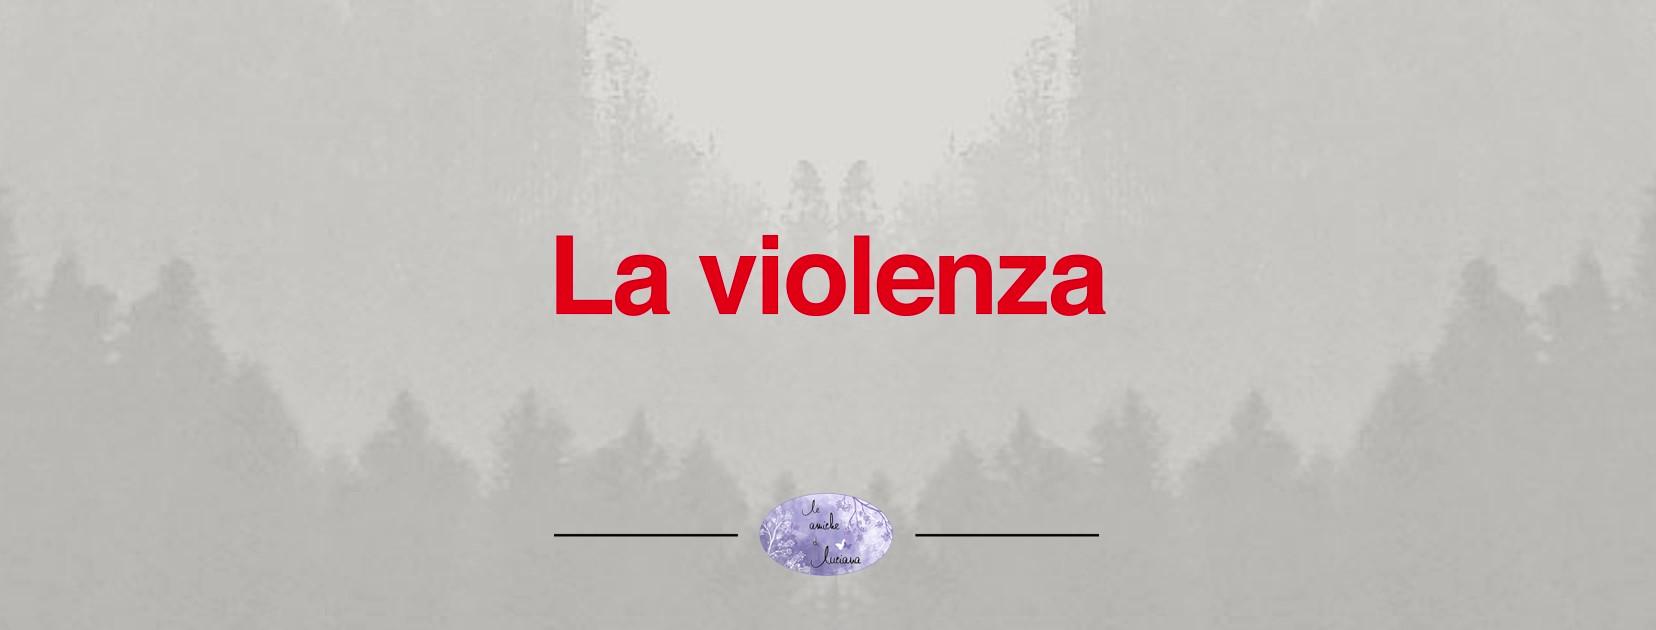 Violenza donne-Novembre2020 (1)_Moment